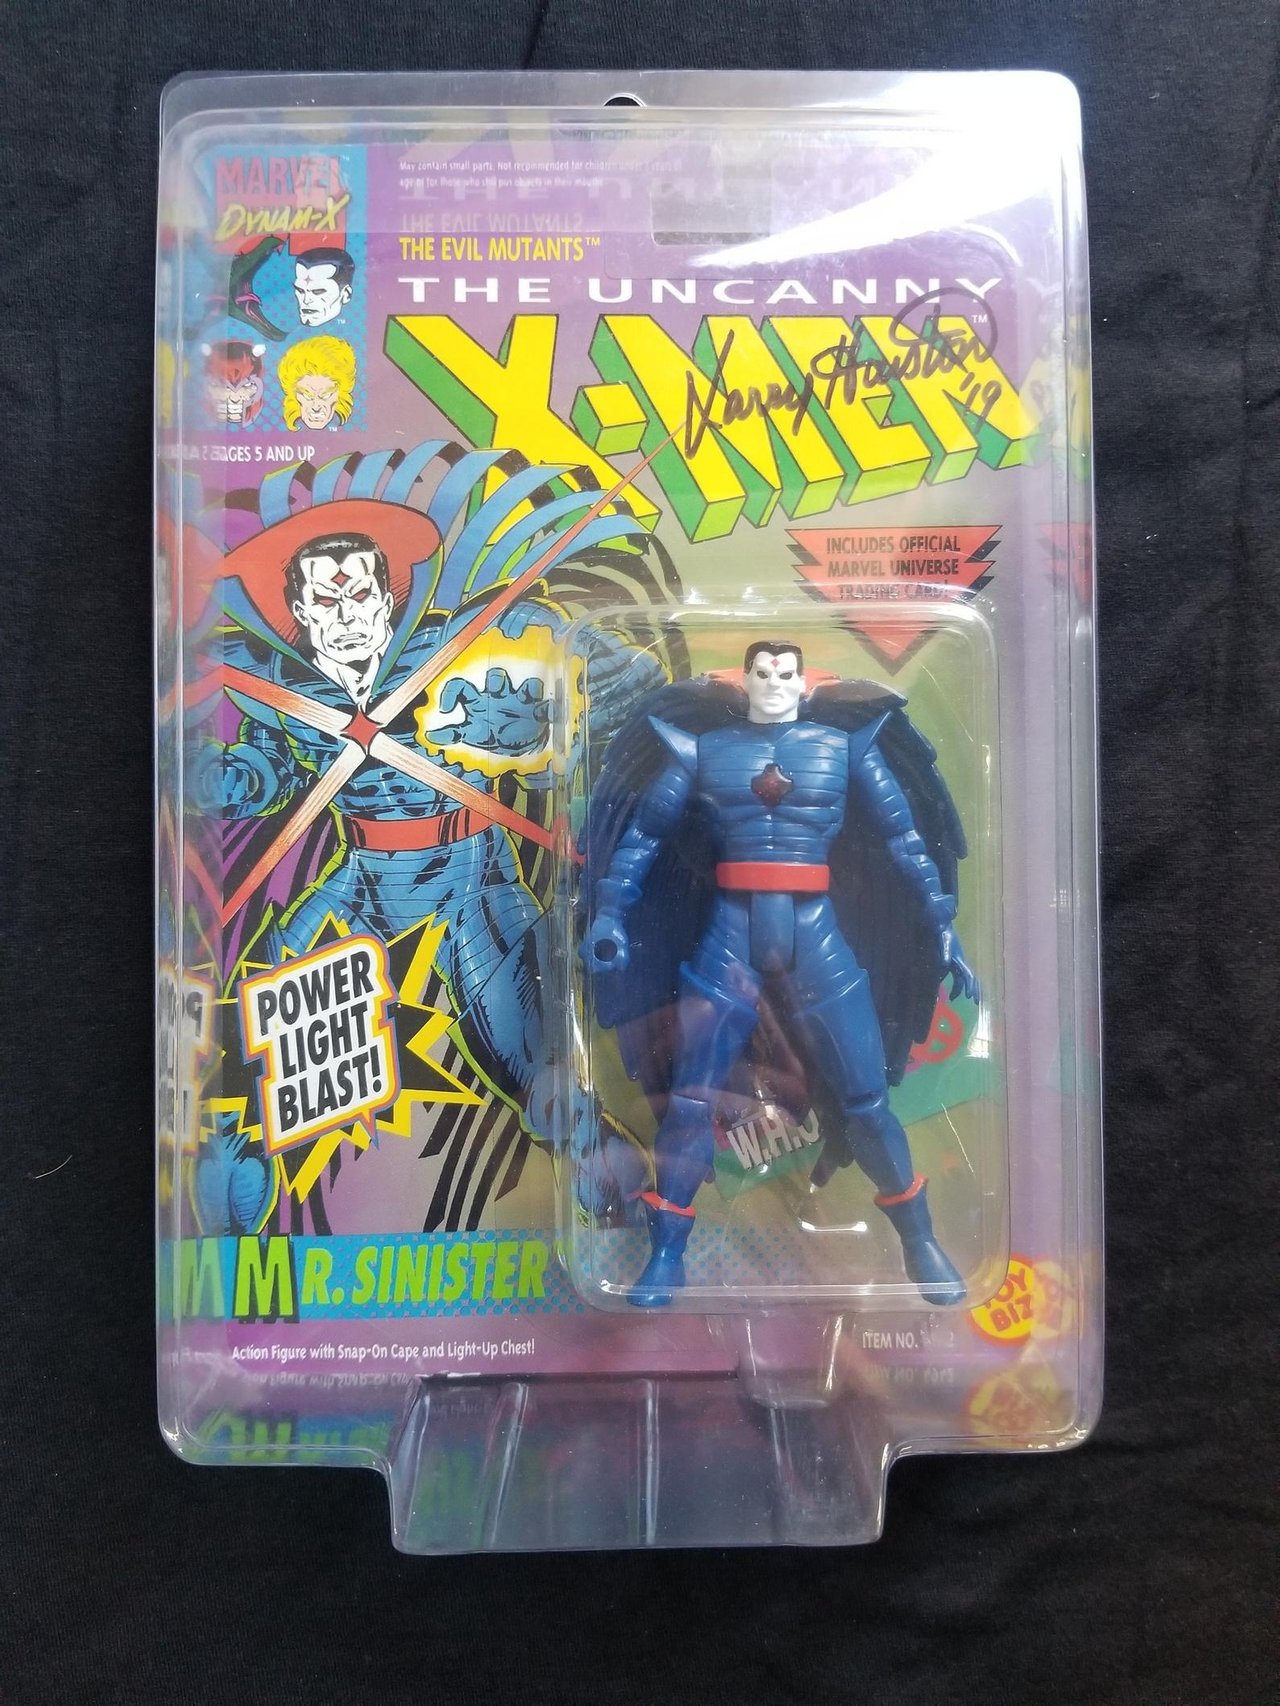 Autographed Toy Biz Mr Sinister Marvel Uncanny X-Men Vintage Signed Action Figure Animated Series Retro Toys Collectibles 1990s Comic Books